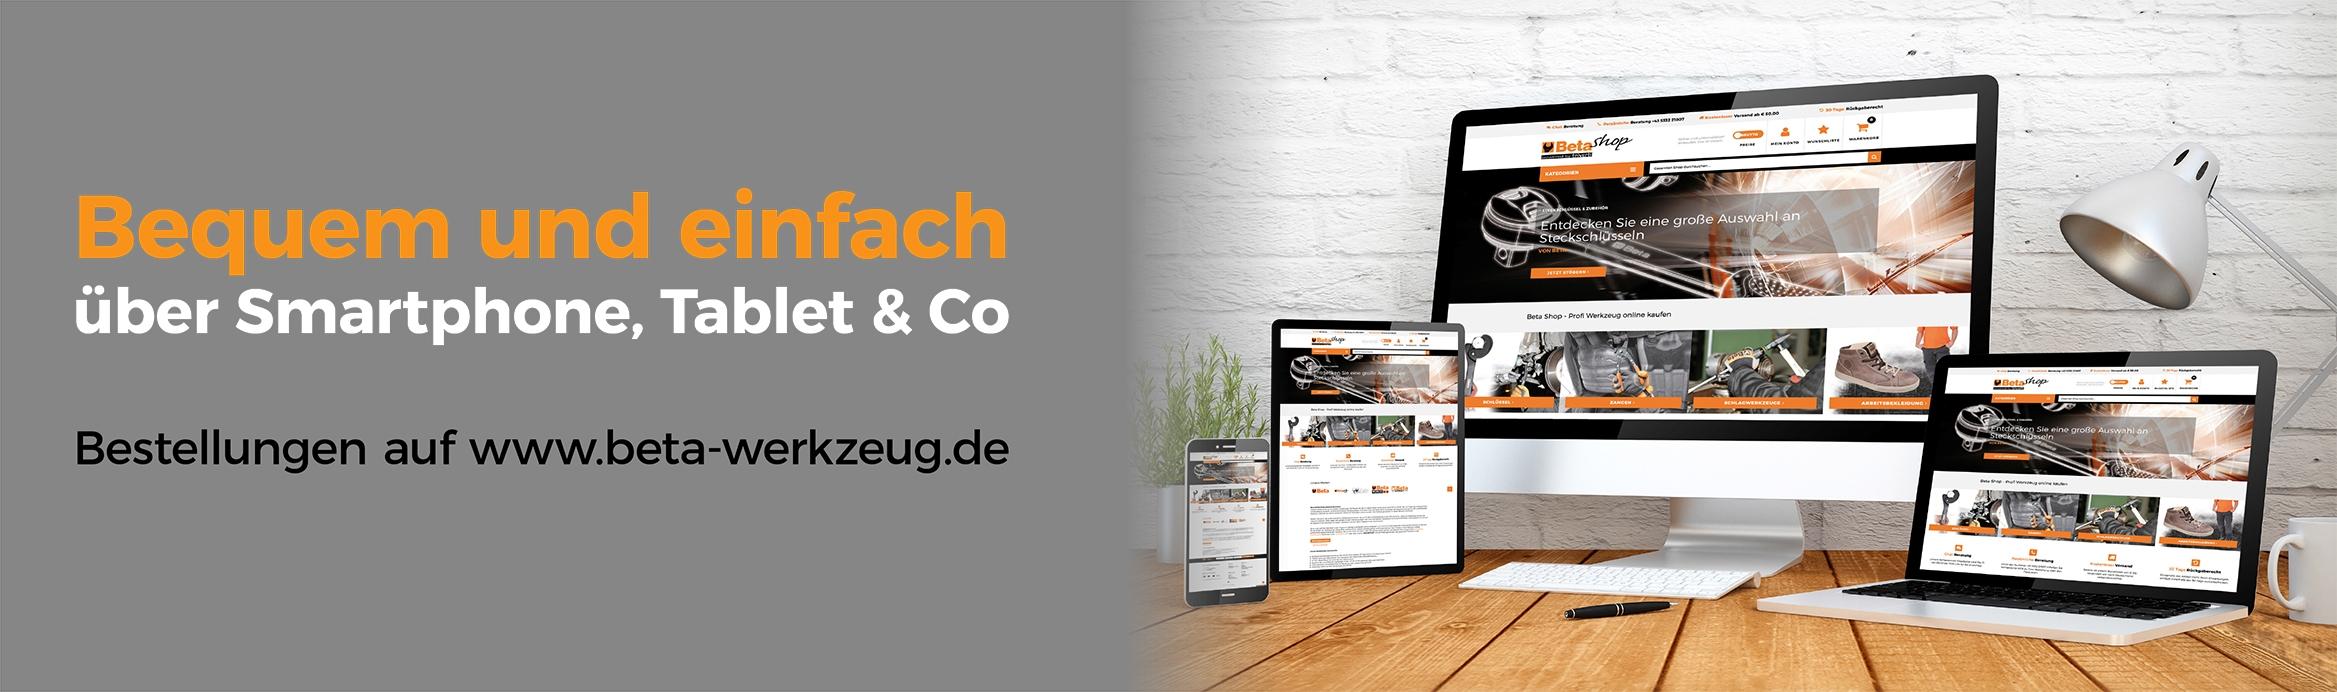 Bestellvorgang www.beta-werkzeug.de